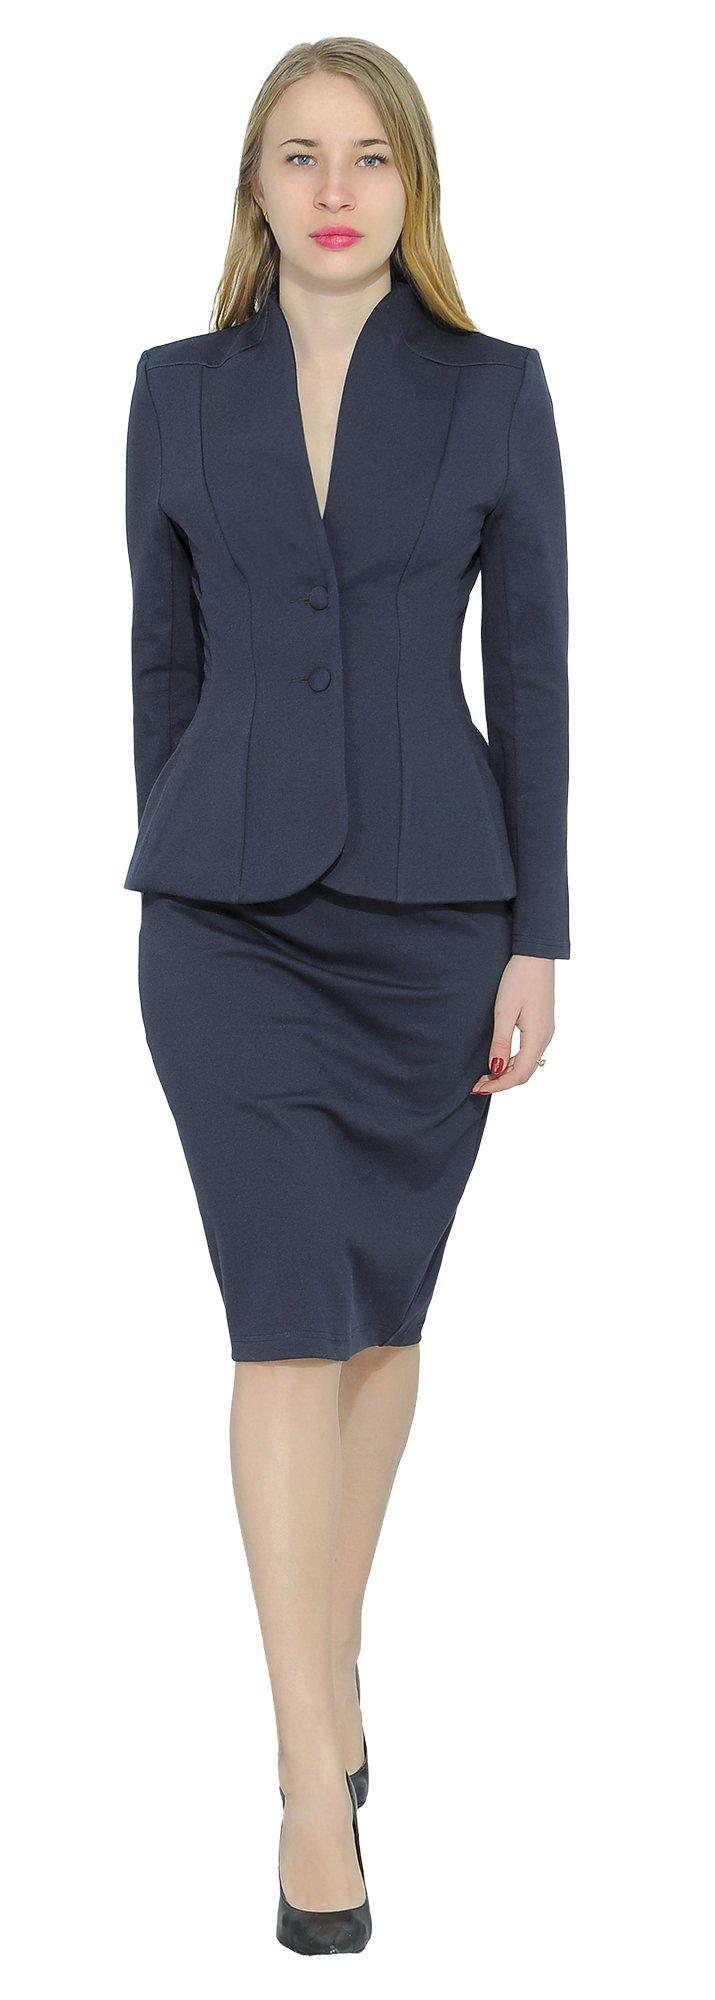 Marycrafts Women's Formal Office Business Work Jacket Skirt Suit Set 12 Dark Blue